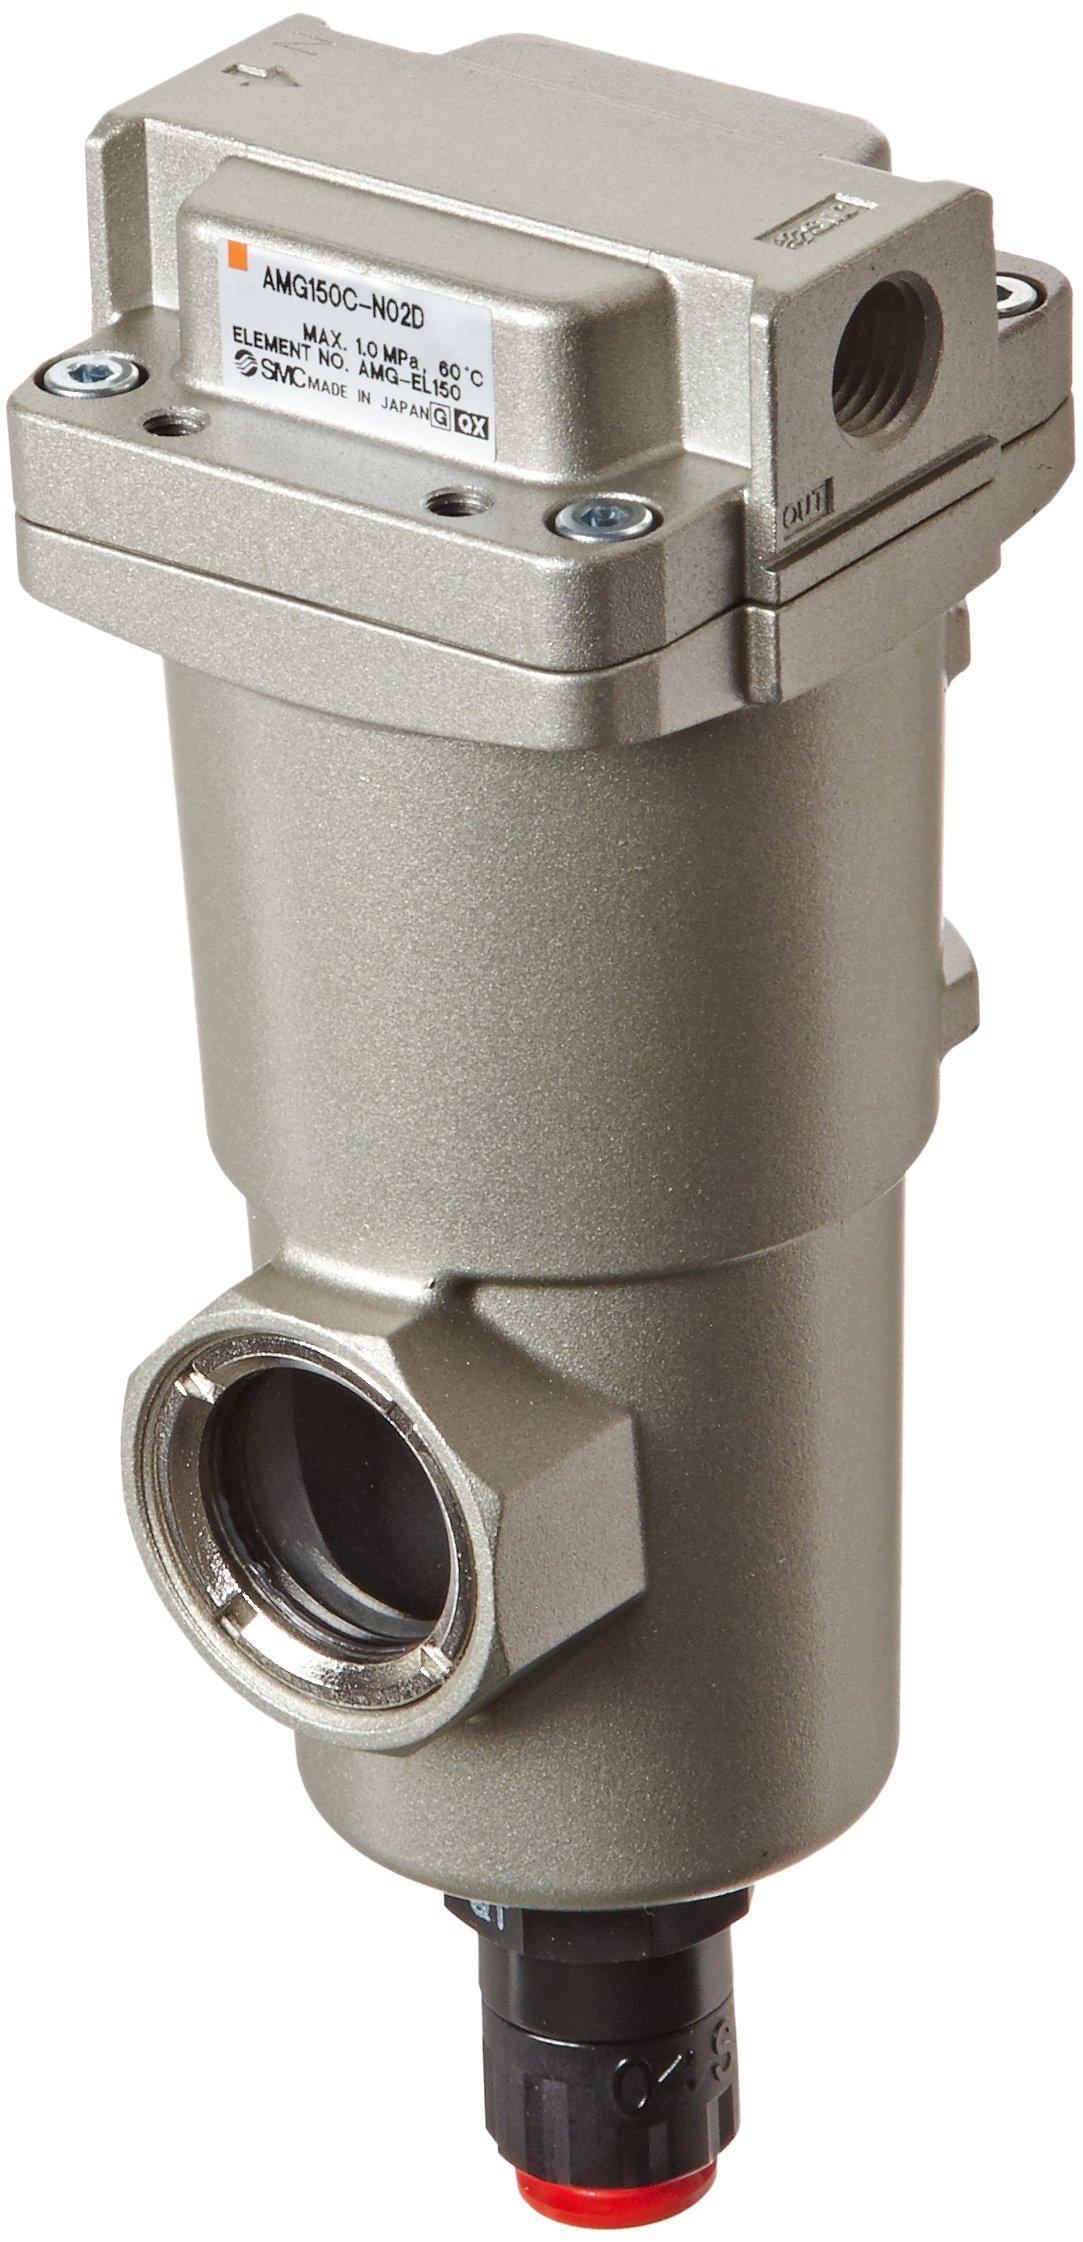 SMC AMG150C-N02D Water Separator, N.O. Auto Drain, 300 L/min, 1/4'' NPT